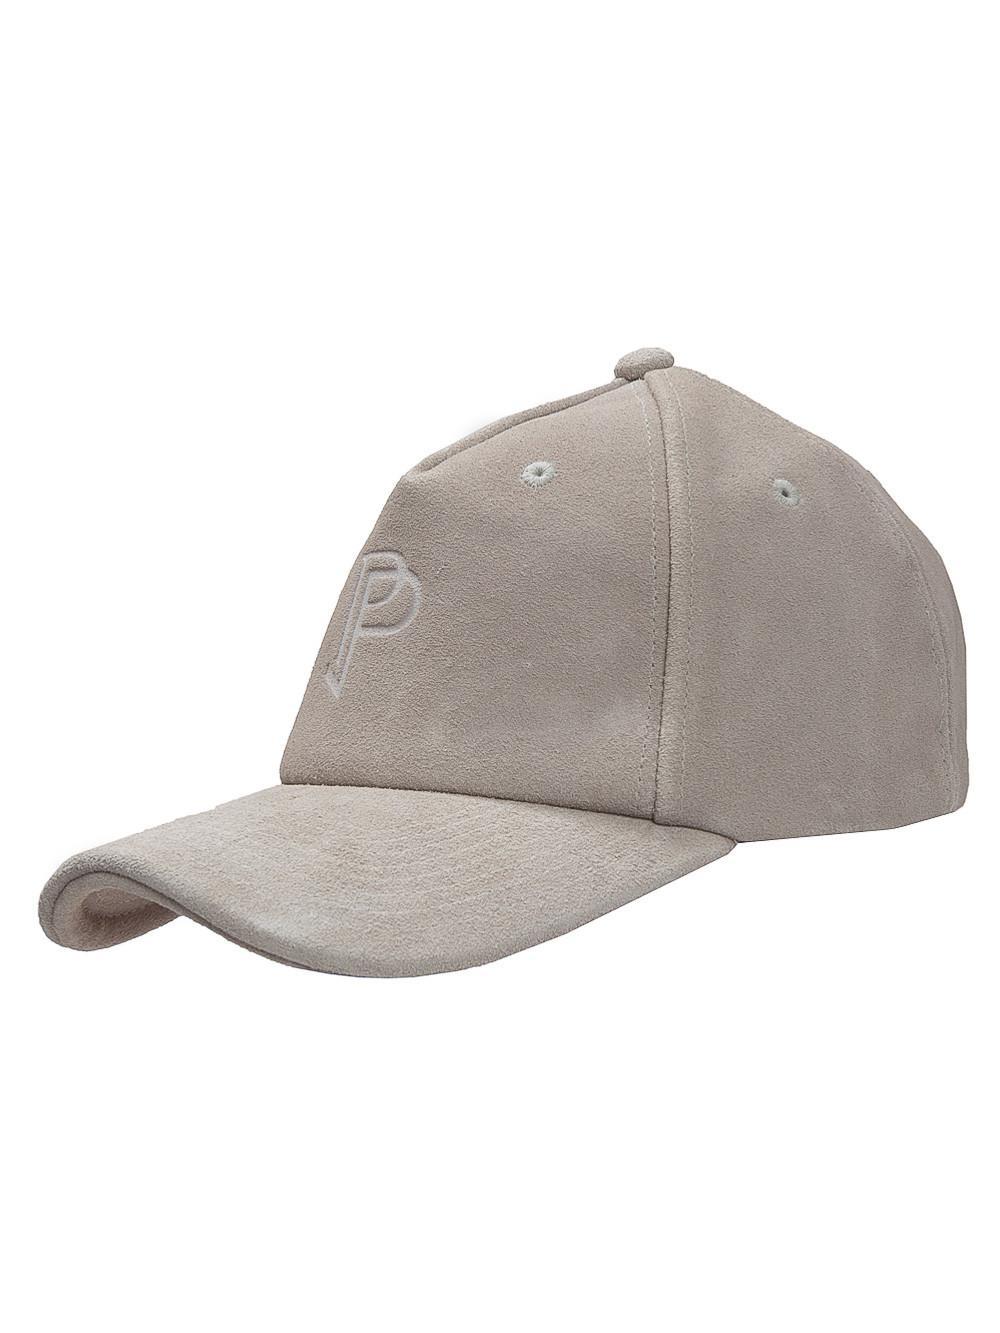 b337c12c243 Lyst - Adidas X Paul Pobga Cap in Gray for Men